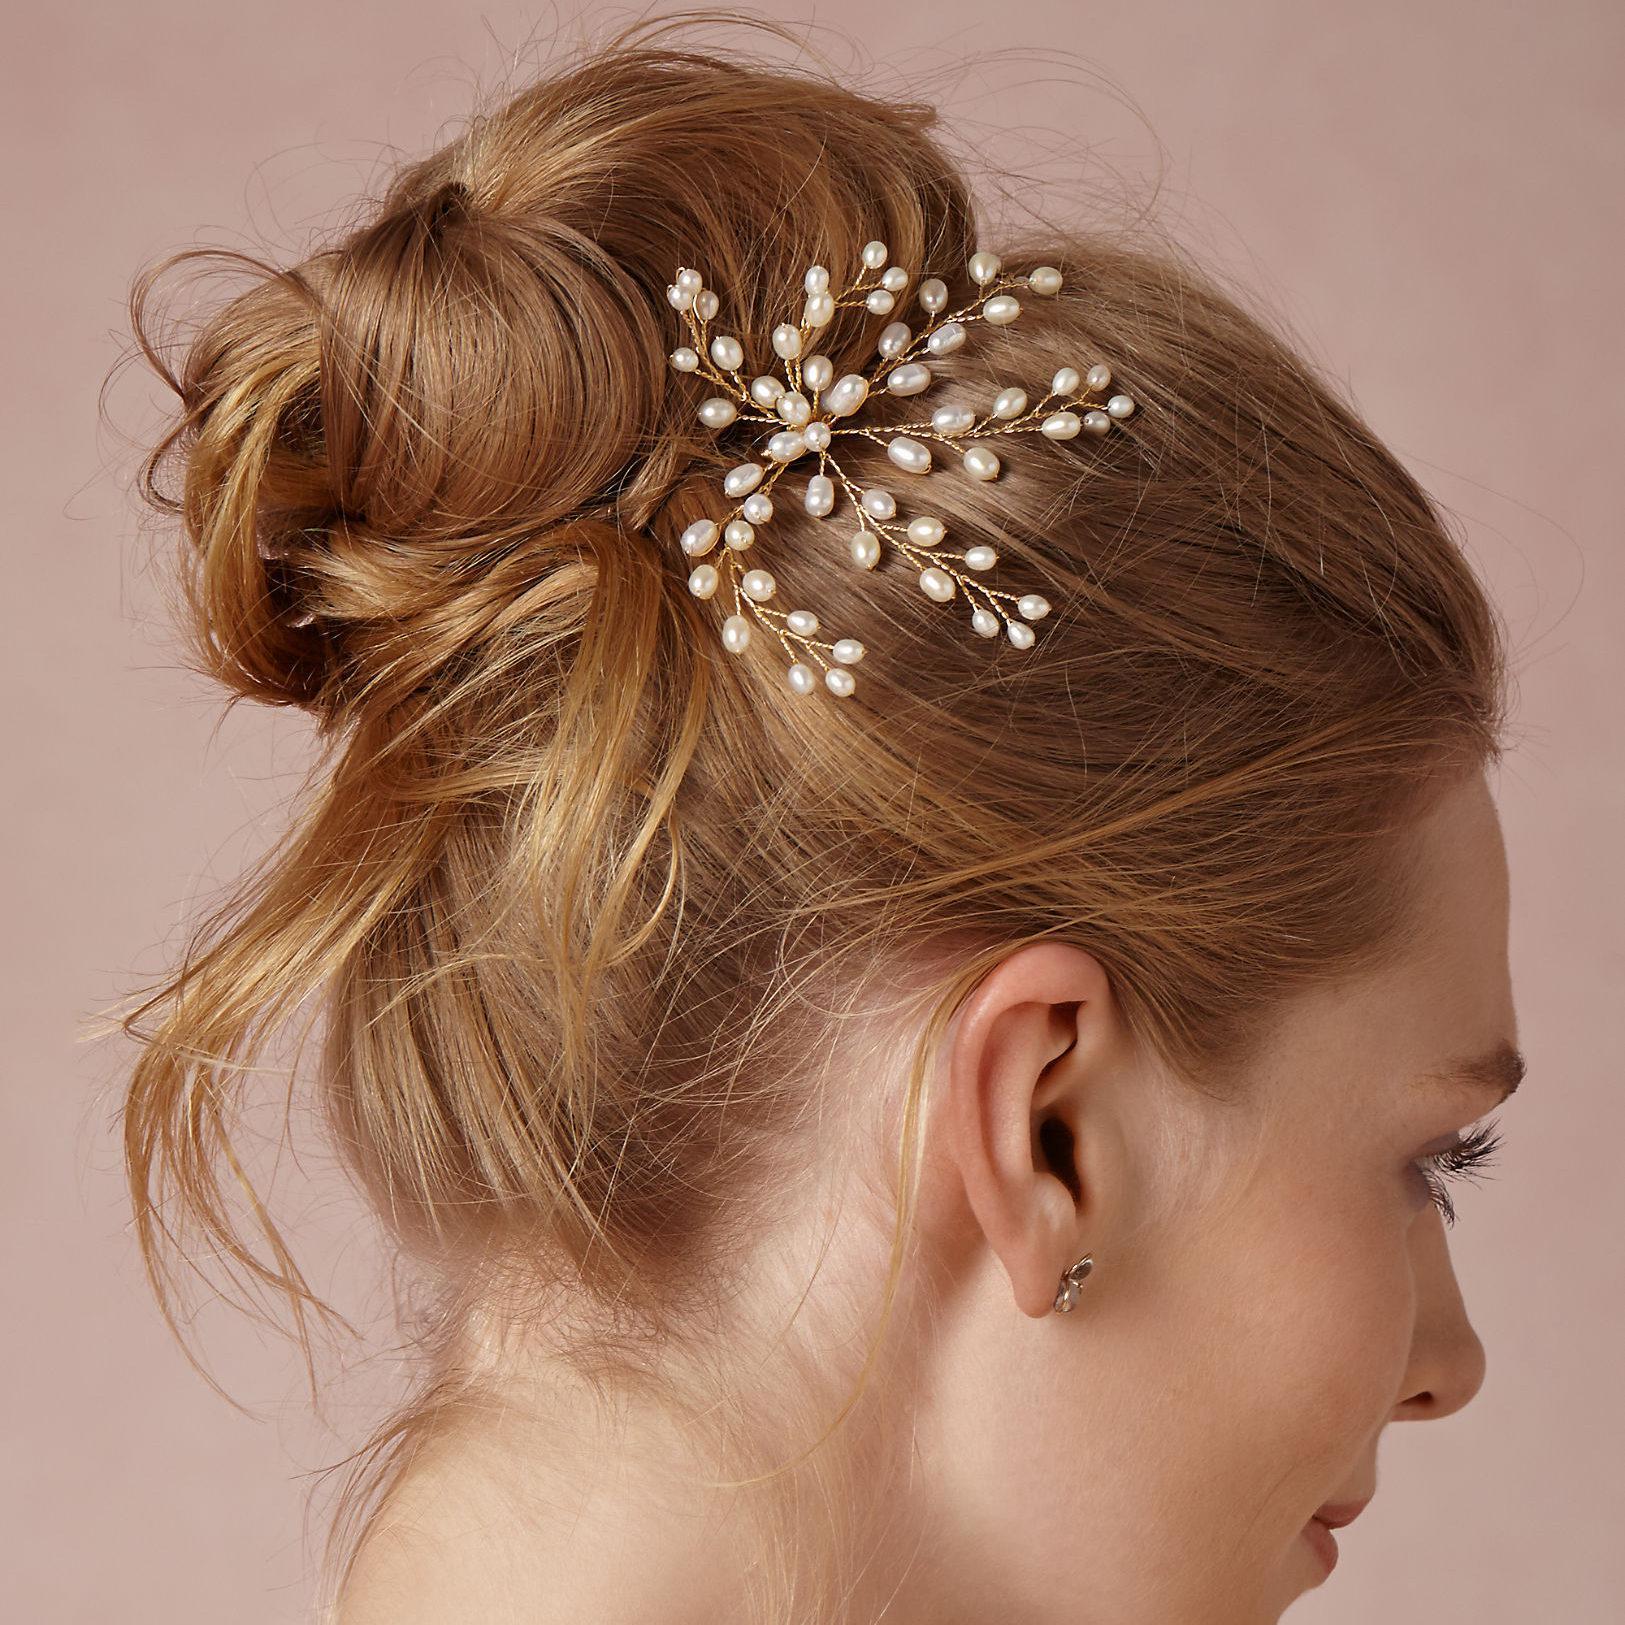 elegant tiaras clip hair pins with 59 fresh water pearl hair accessories flower pearl hair pins for weddings vintage bridal hair combs pearl bridal